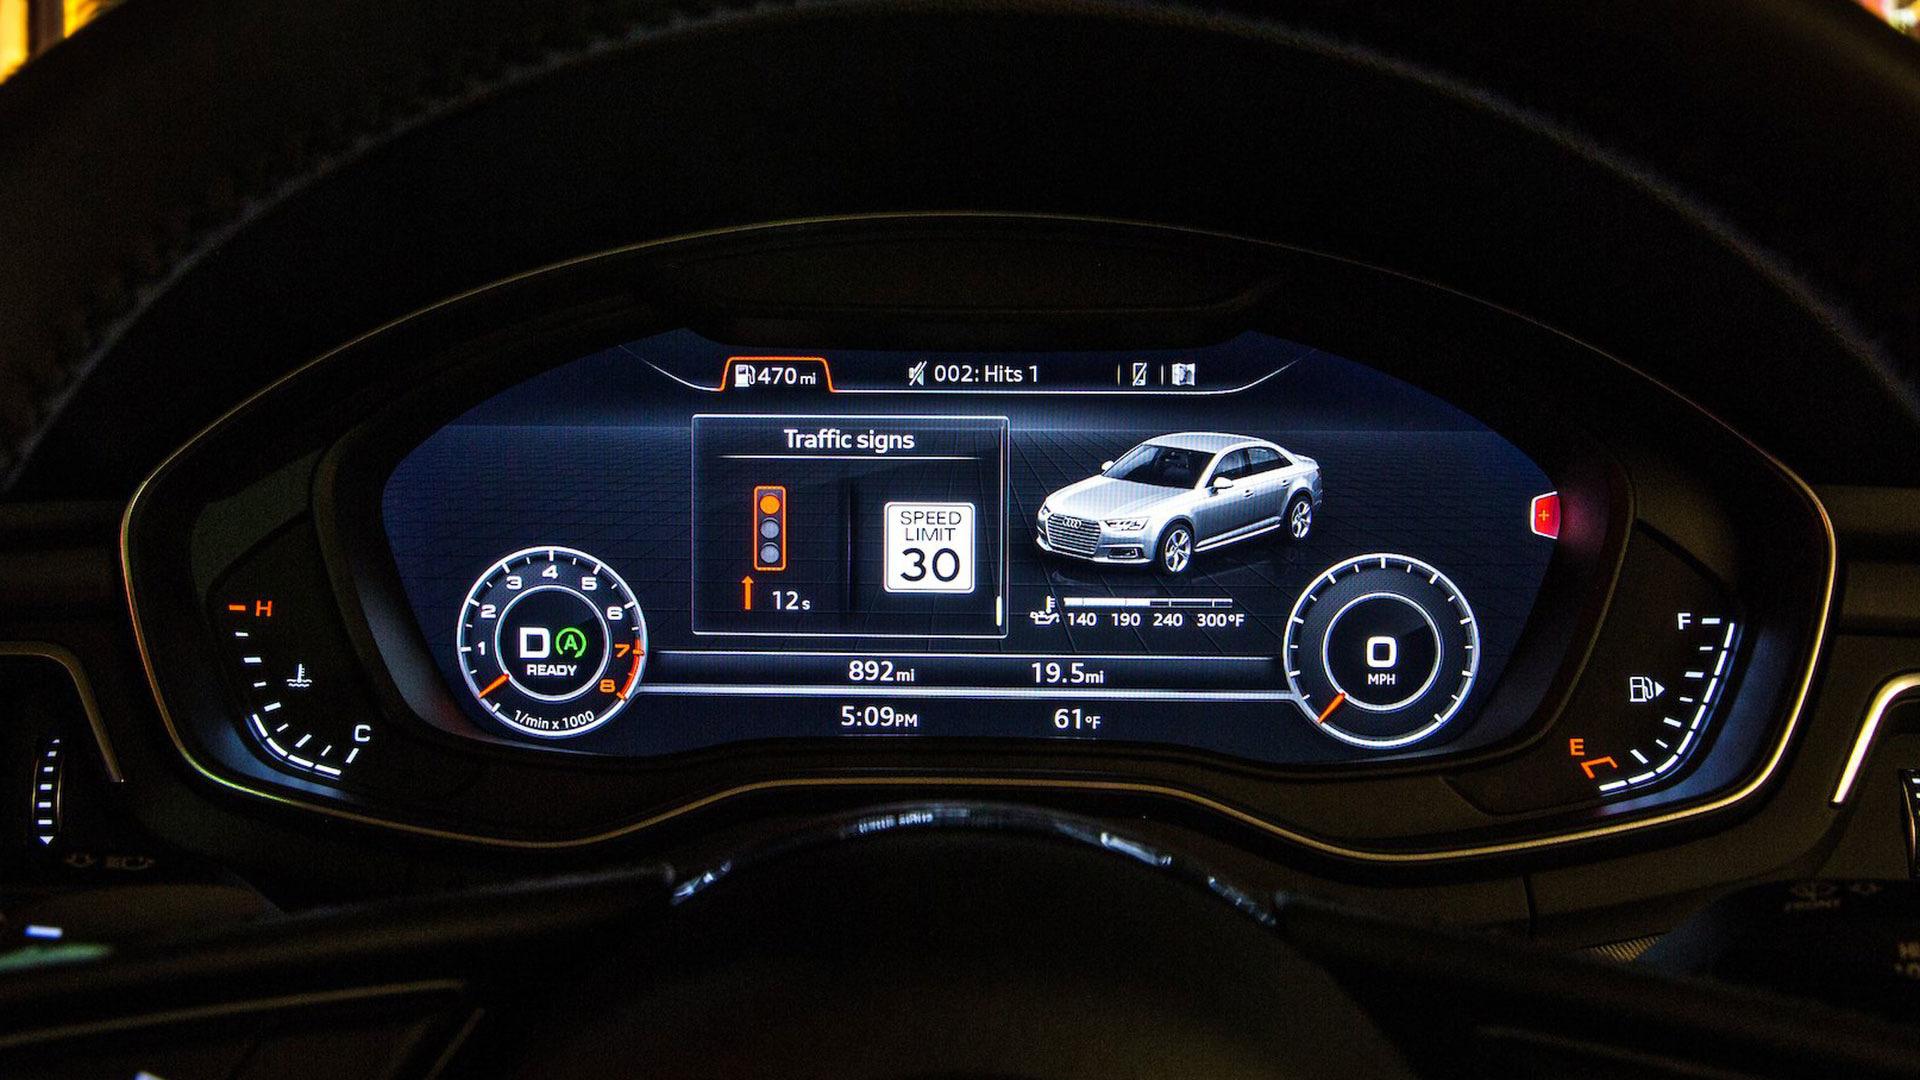 audi-traffic-light-information-display (1)